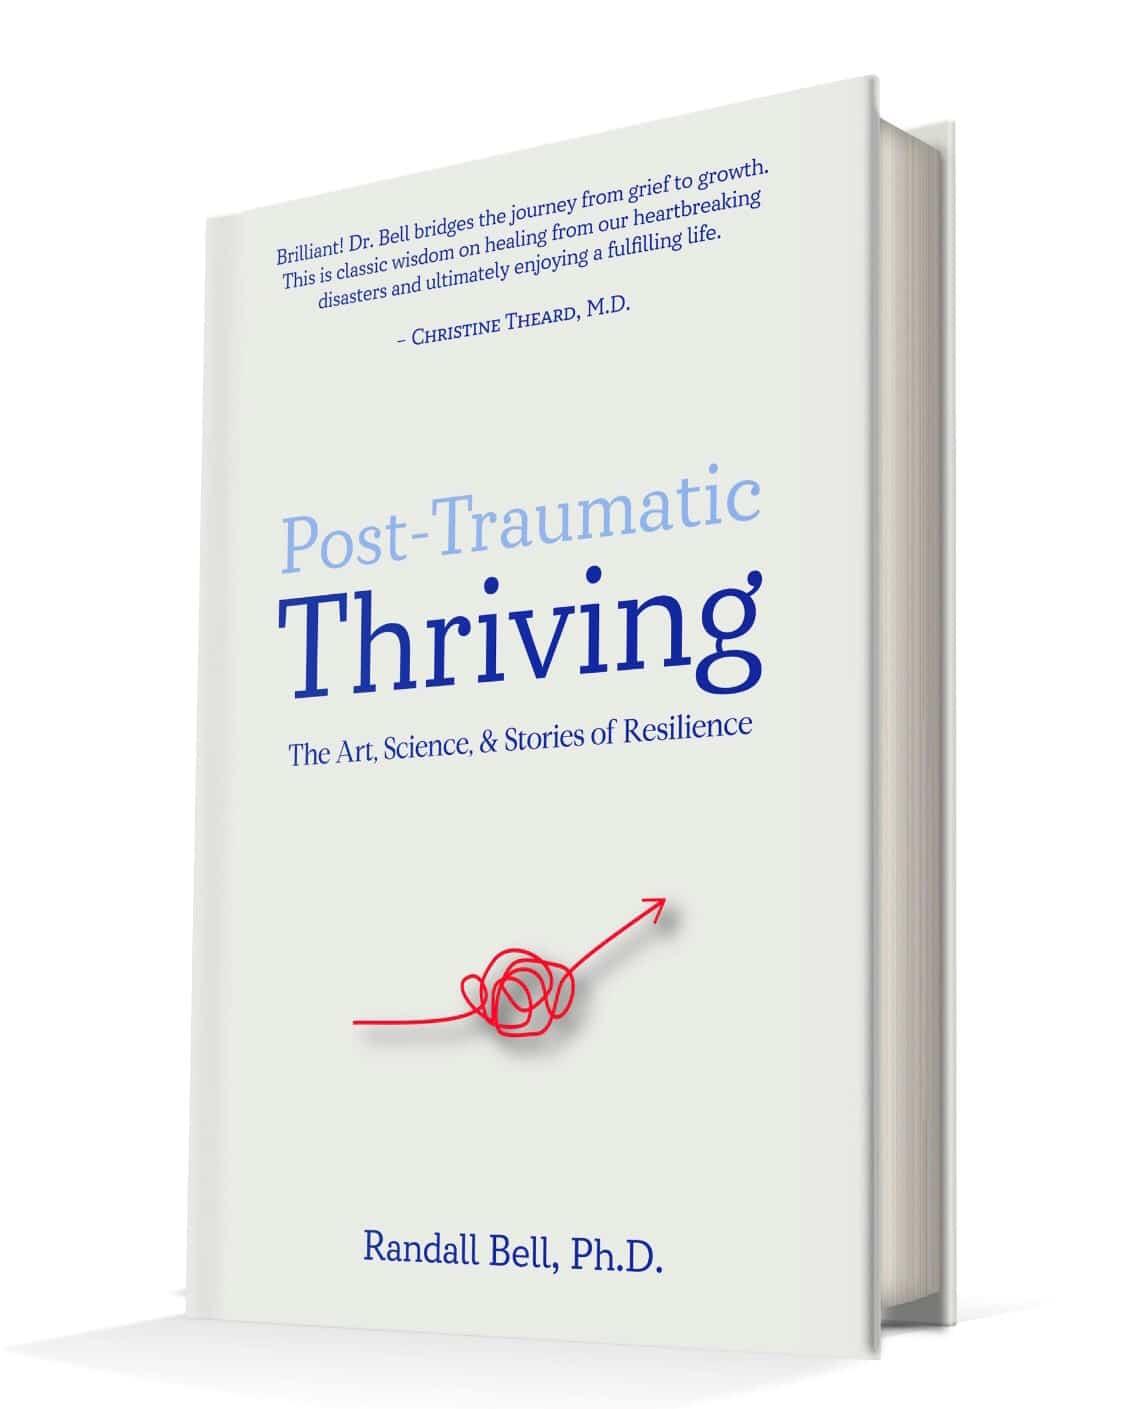 Post - Traumatic Thriving - Randall Bell, Ph.D.